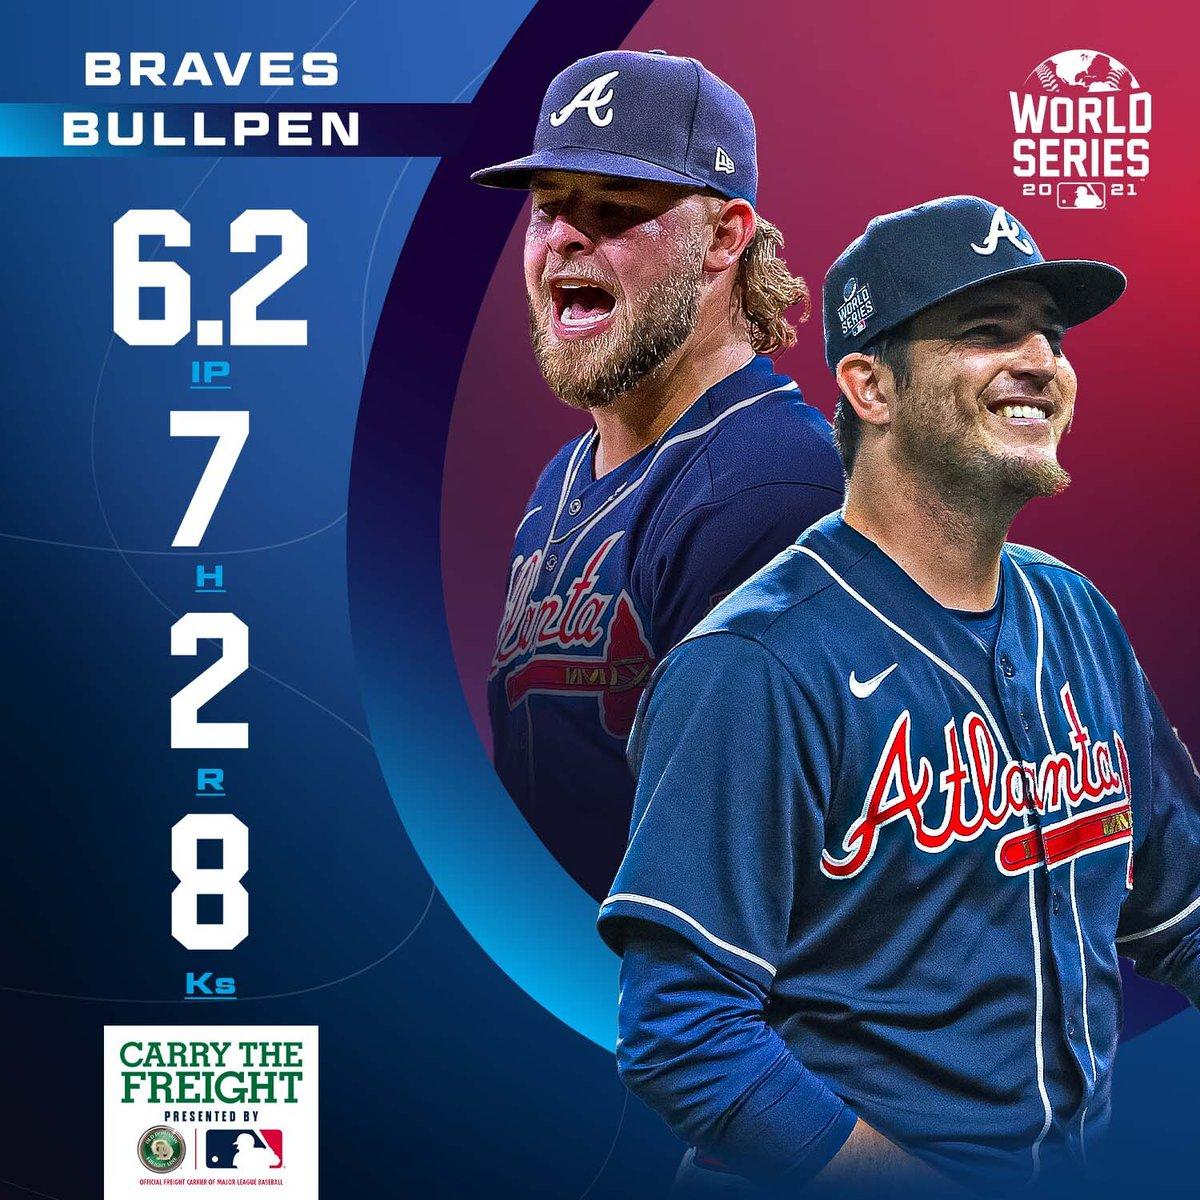 @MLB's photo on Braves